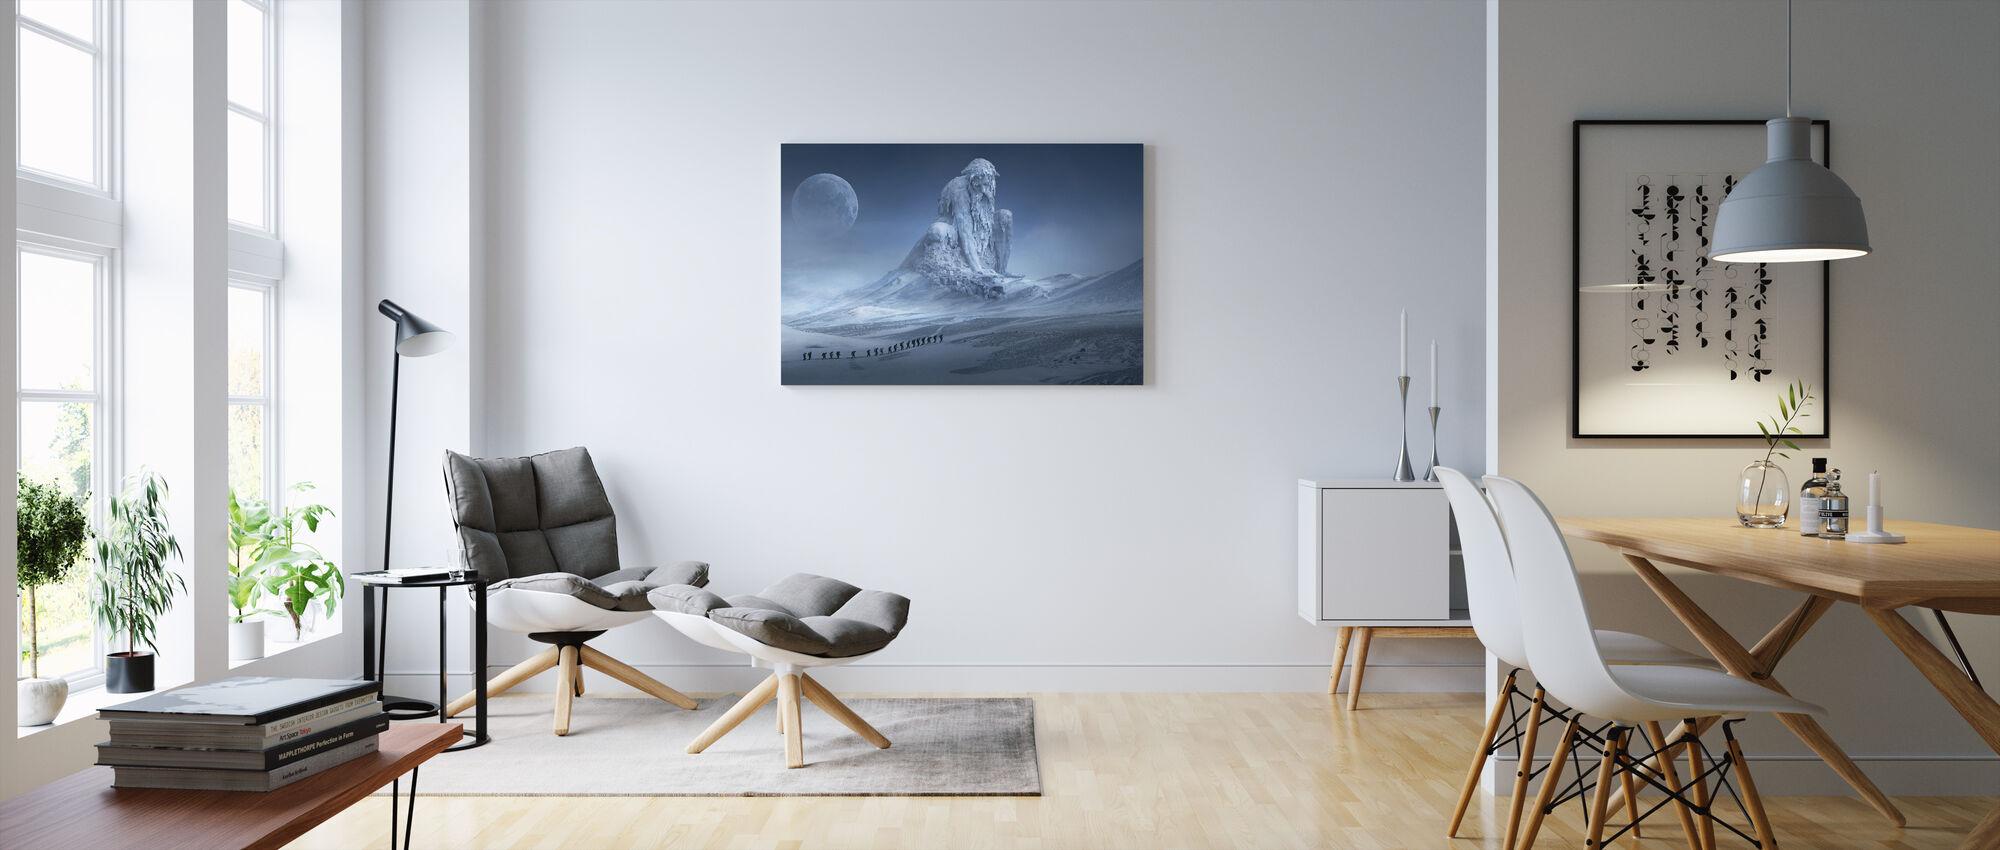 Fantasy Snow Landscape - Canvas print - Living Room